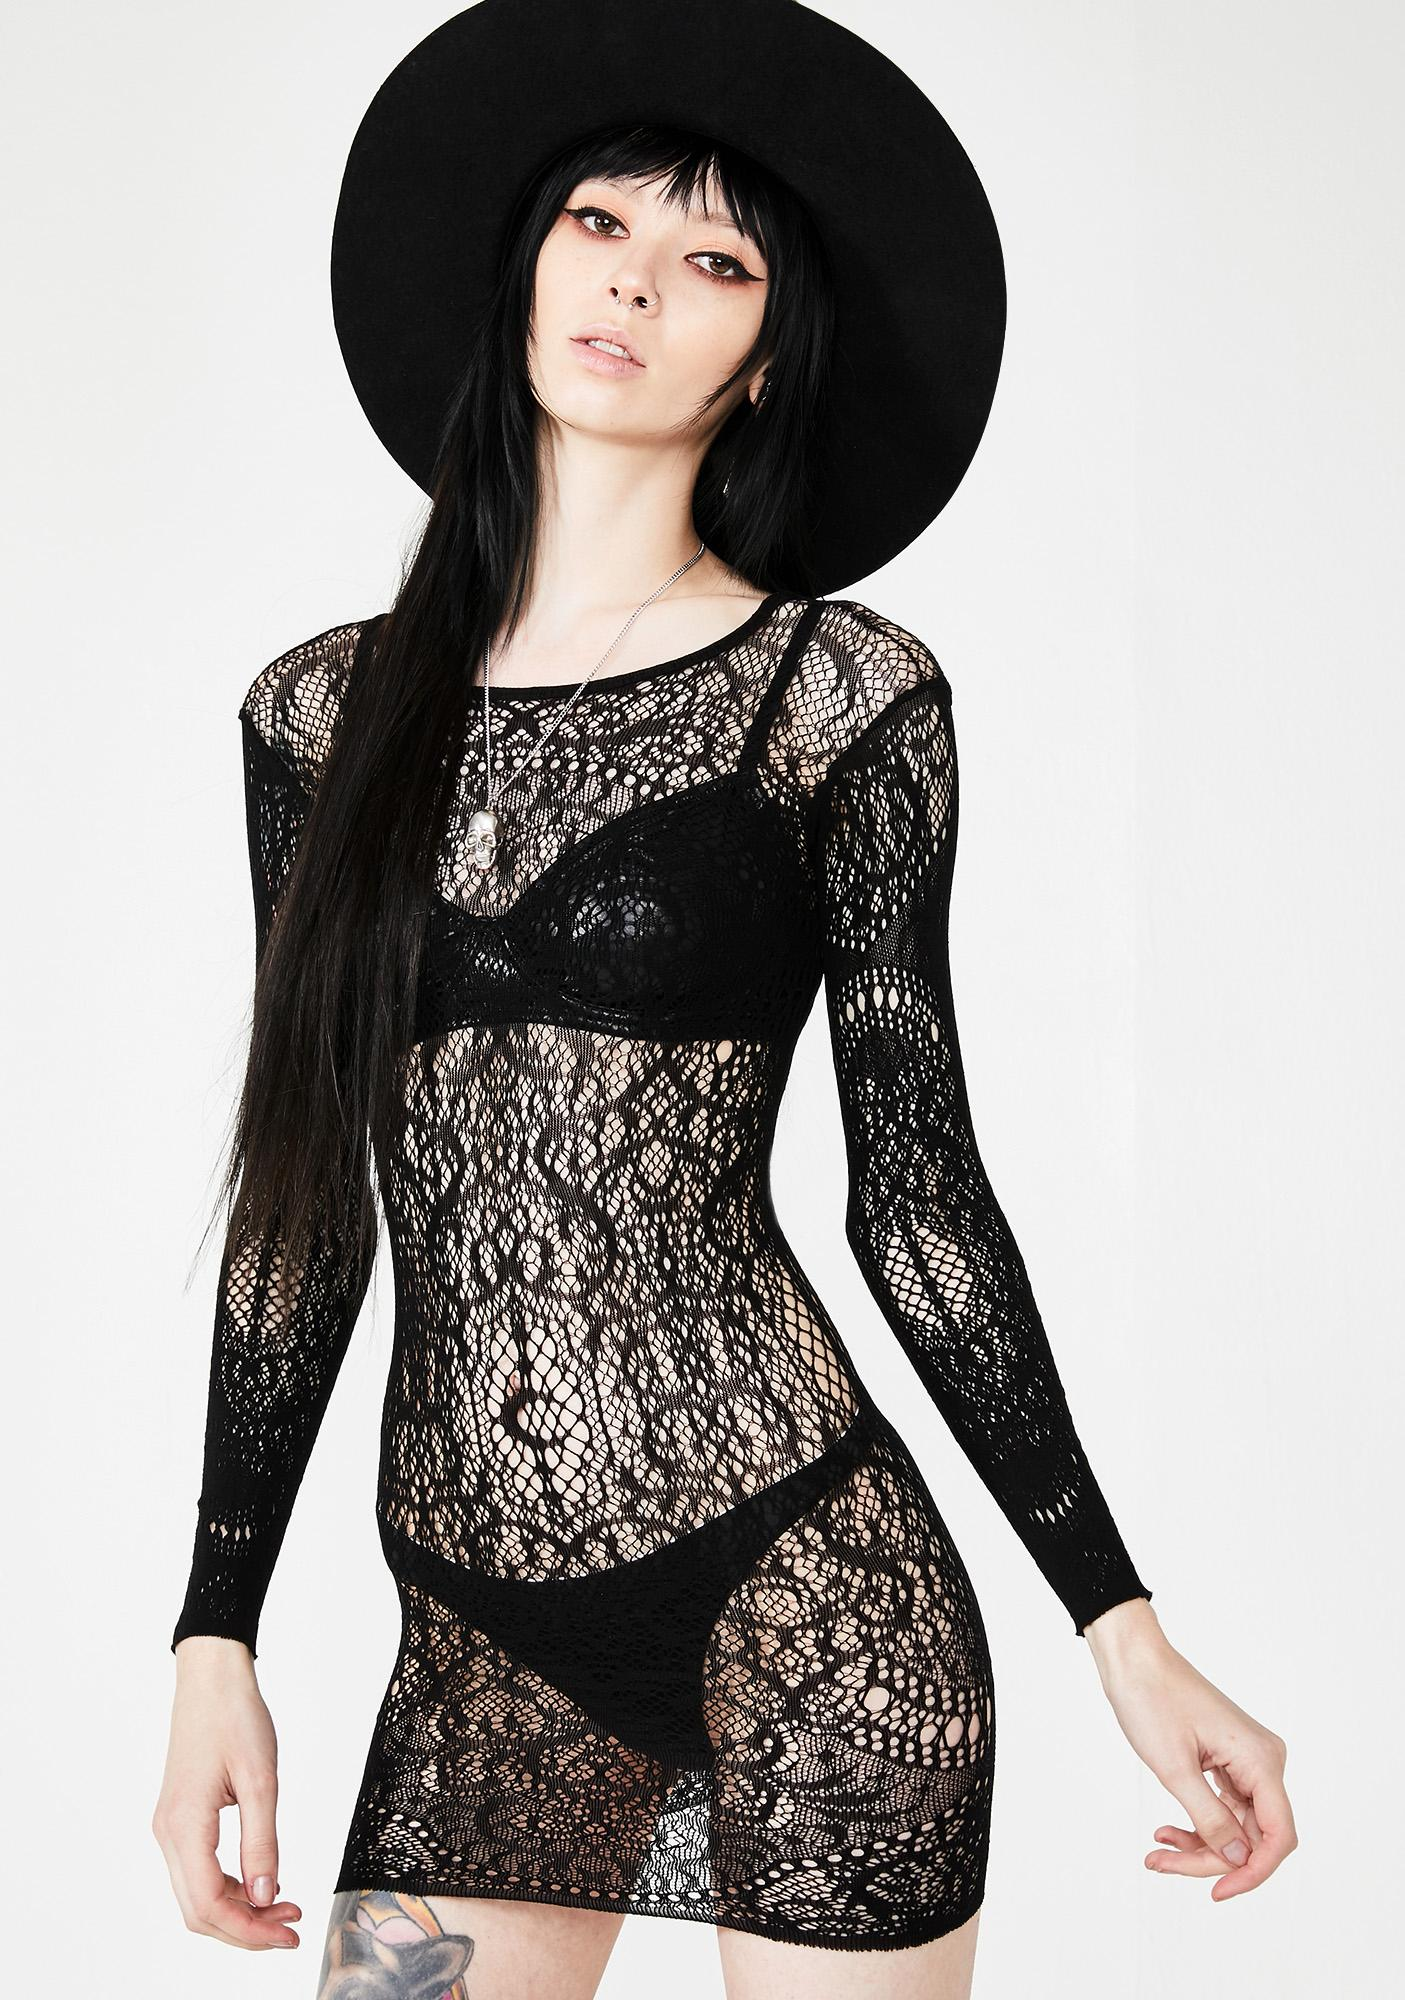 bbce2176b6d1 Killstar Ceres Chaos Lace Bodycon Dress